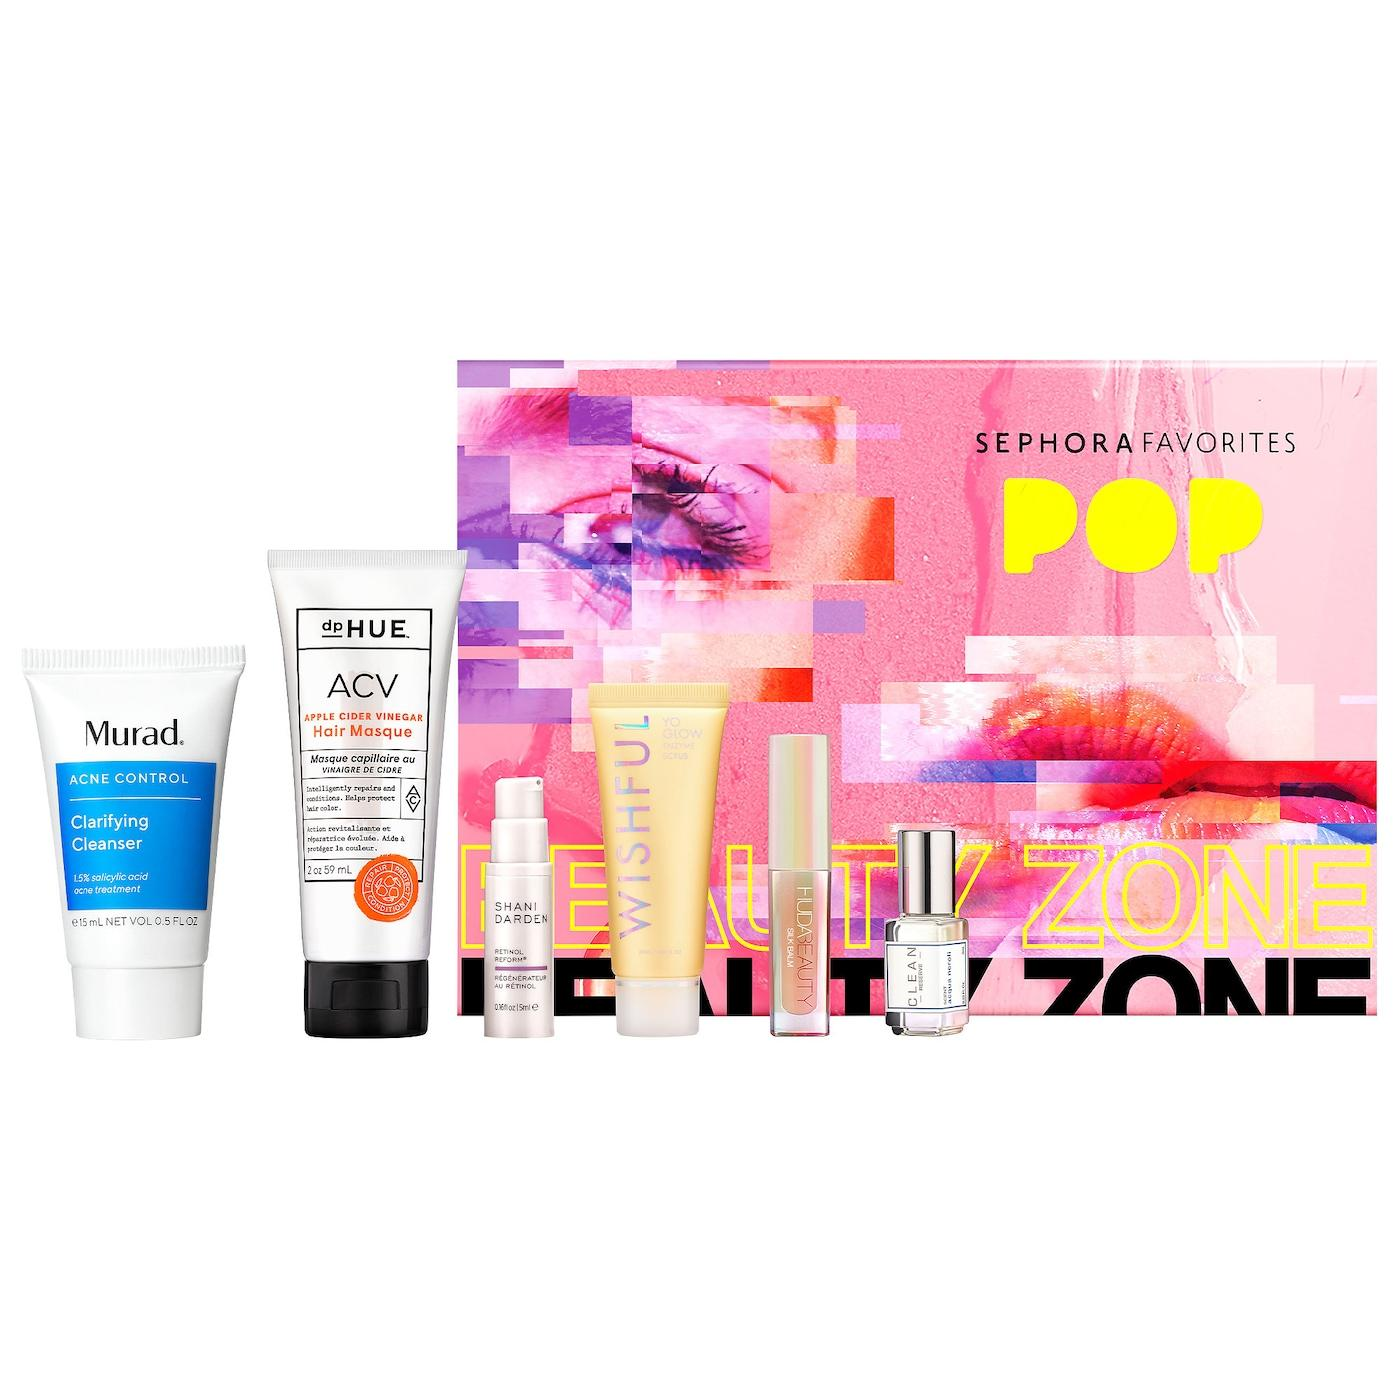 SEPHORA Favorites POP – Beauty Zone – On Sale Now!